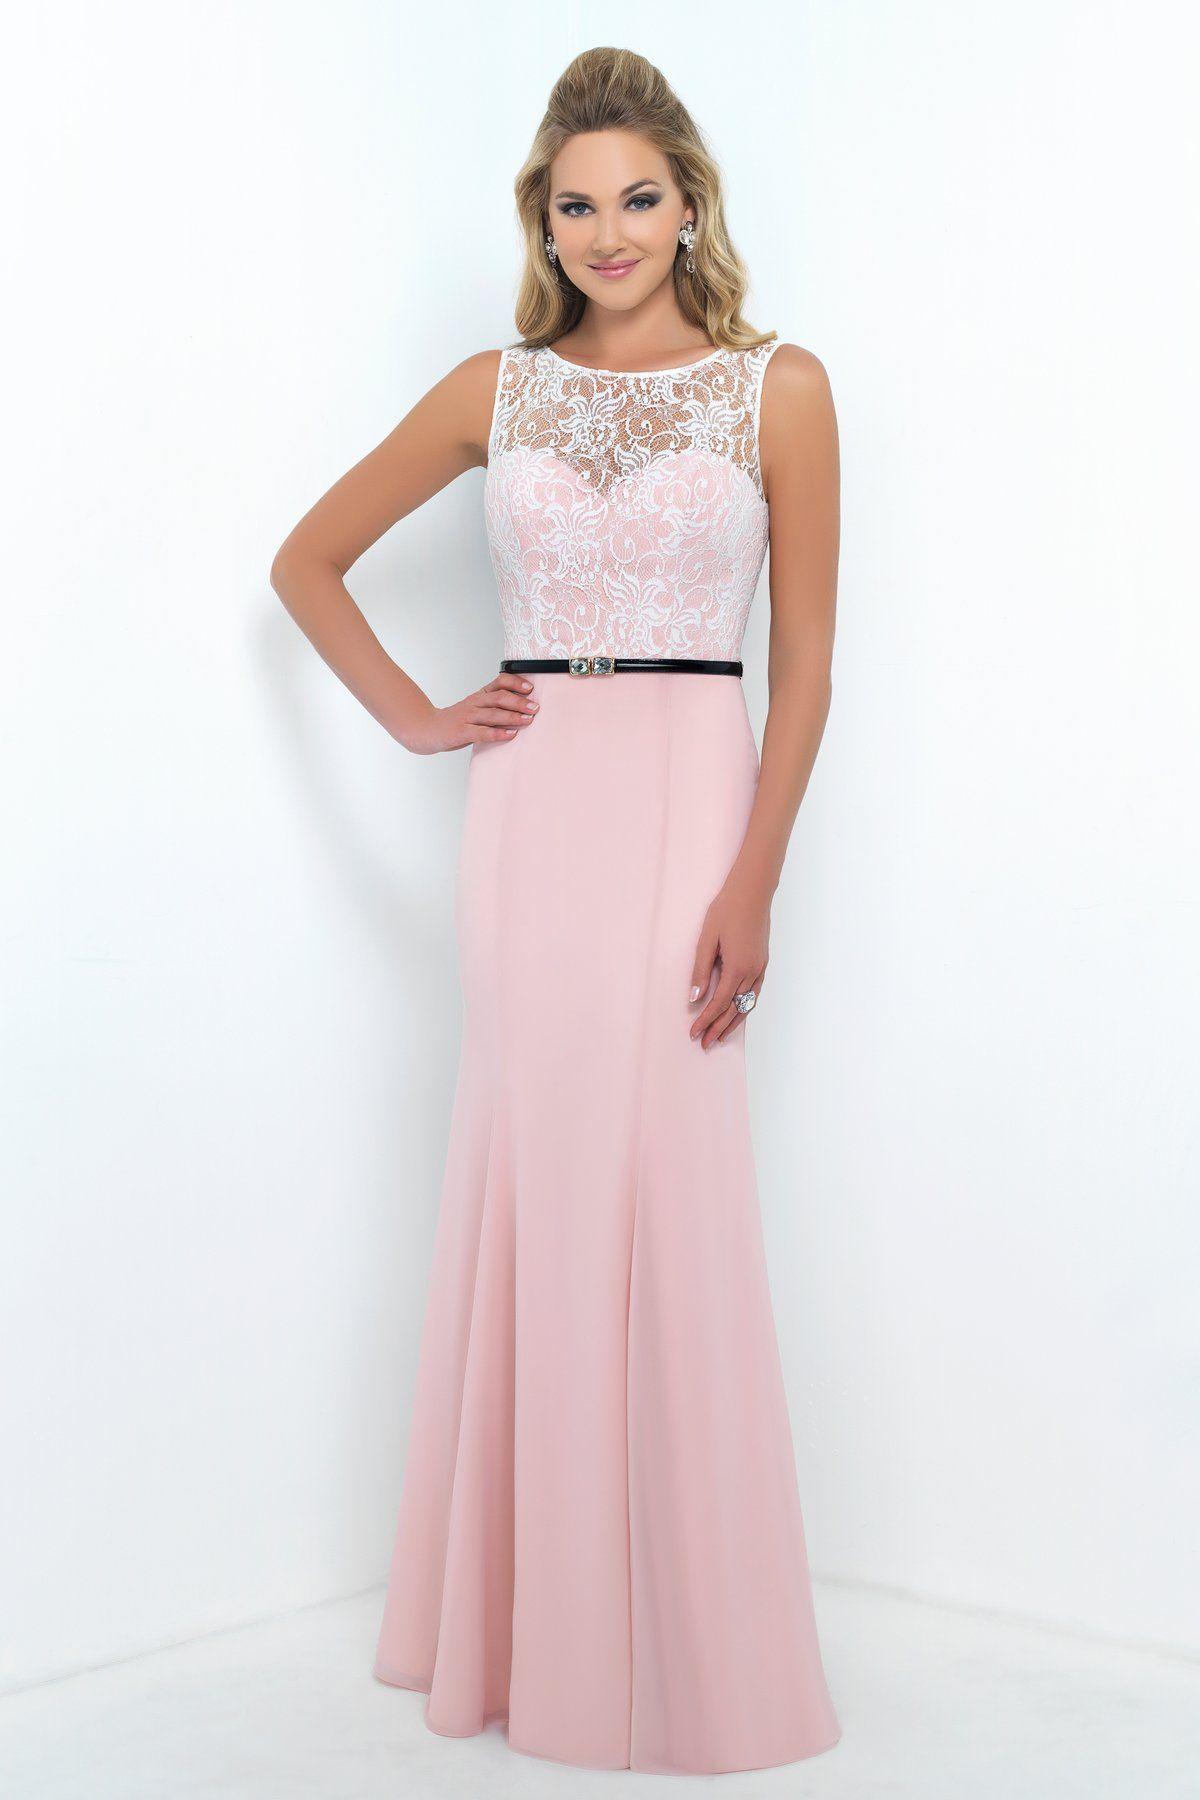 Alexia Designs style Bella Chiffon bridesmaid dress with lace